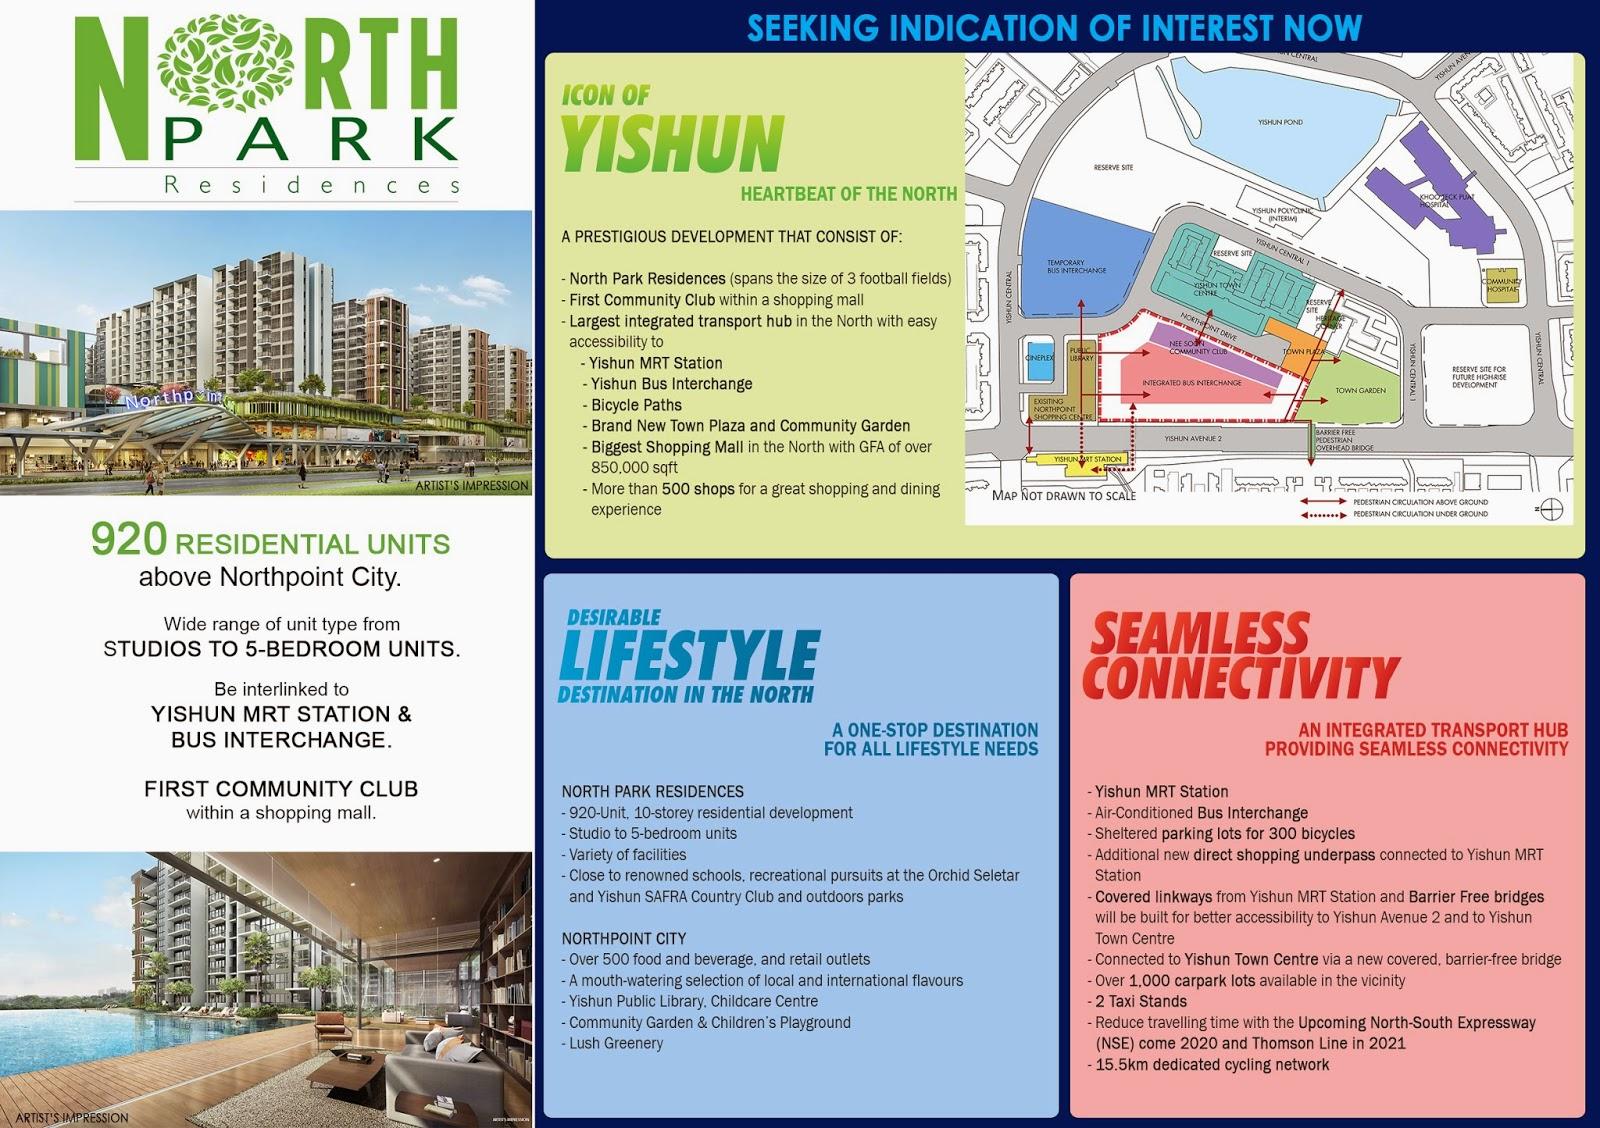 amenities near north park residences